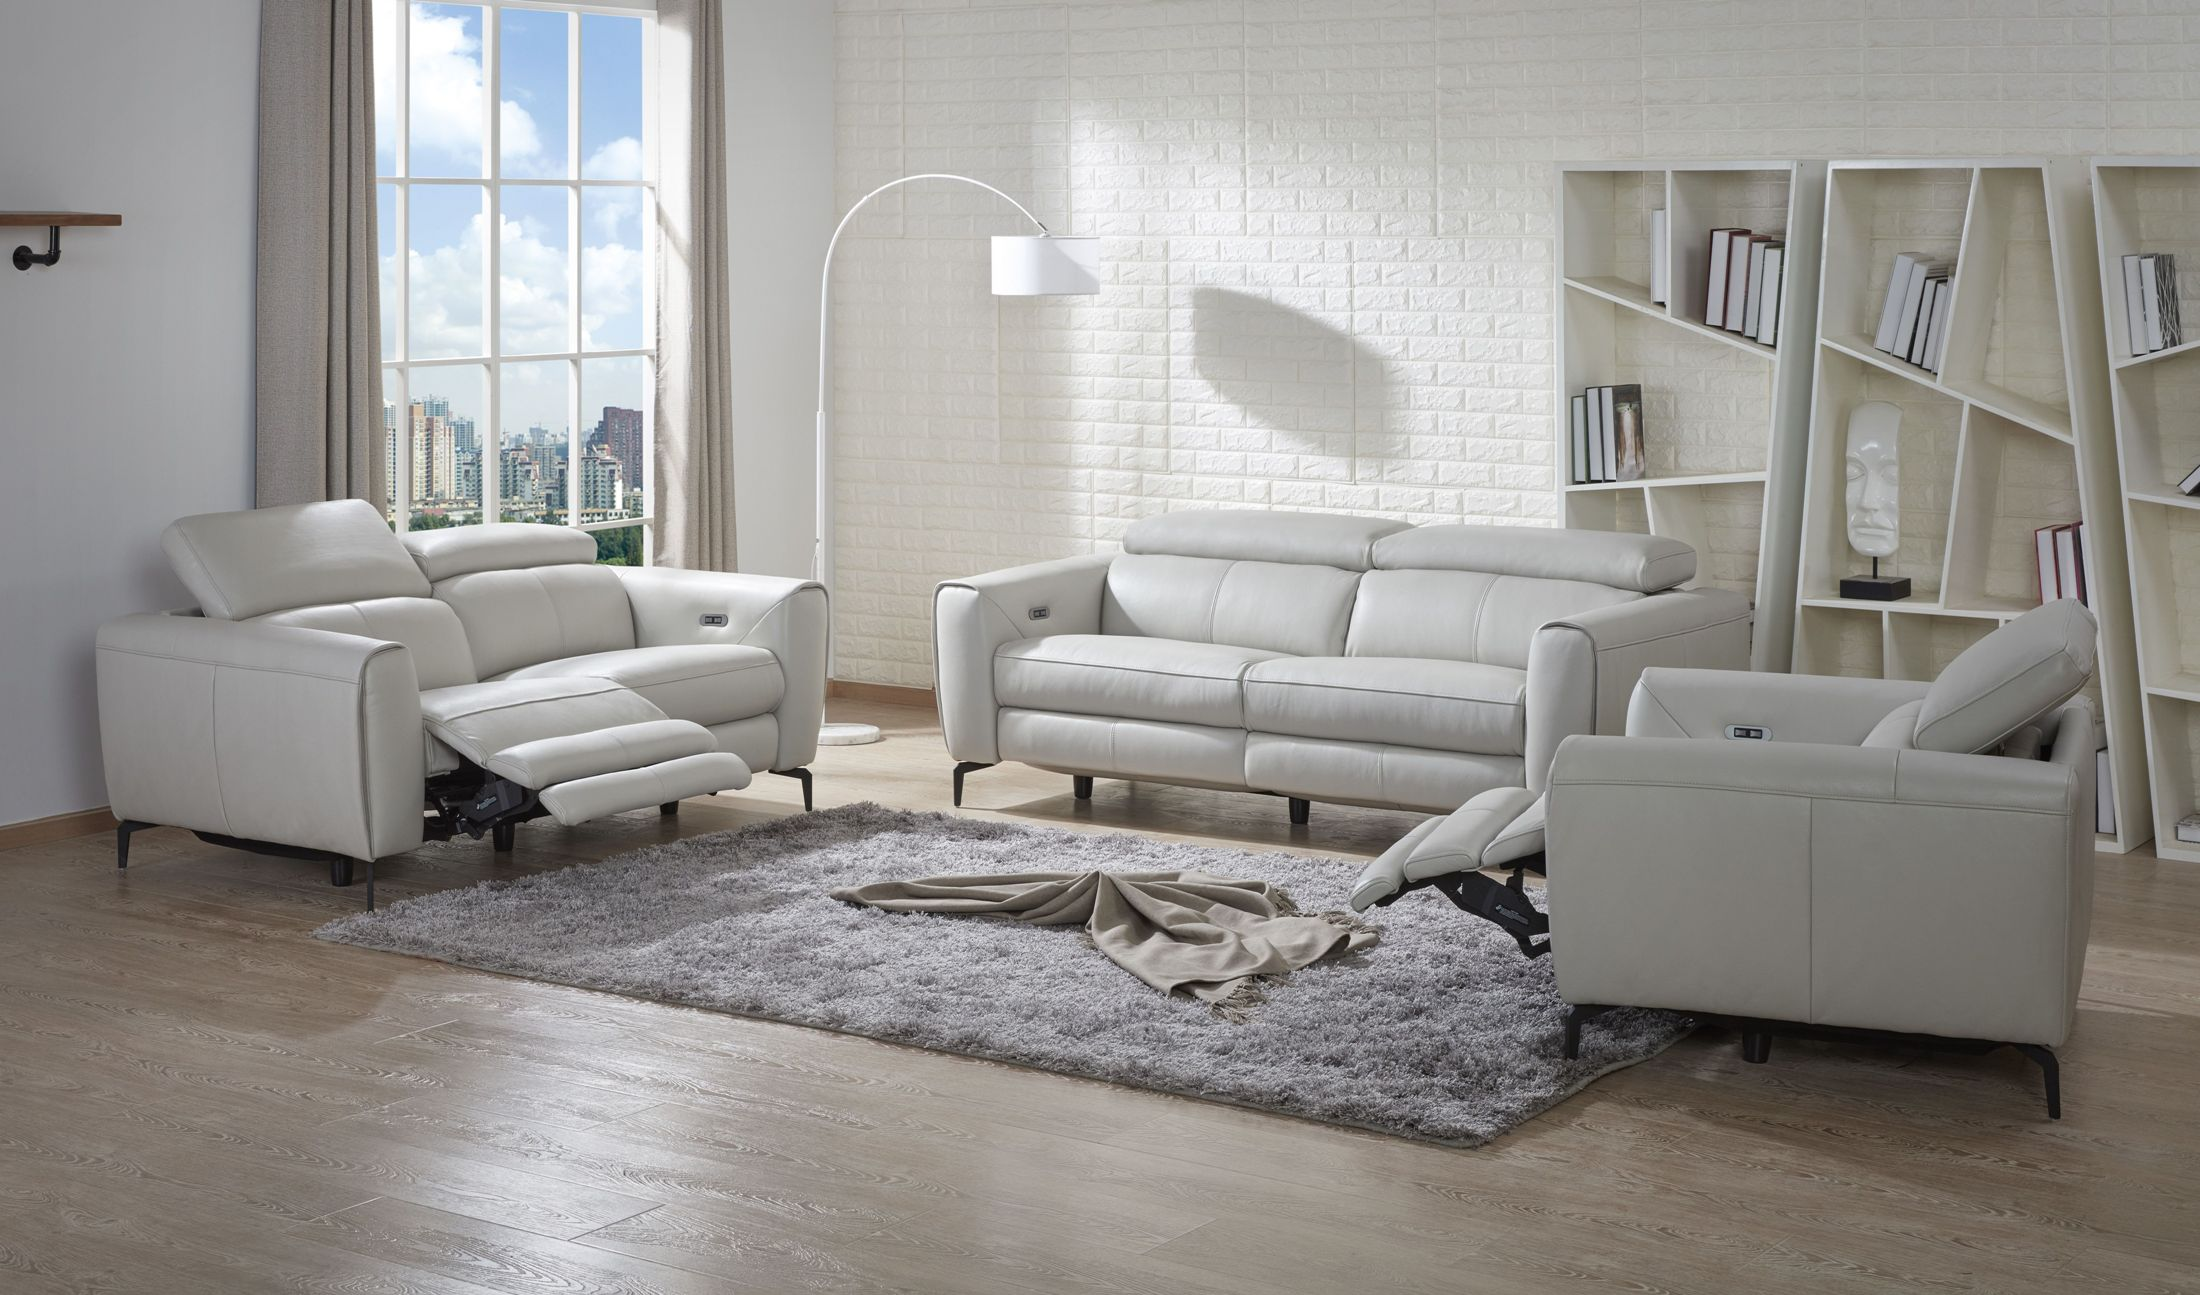 Fabulous Lorenzo Light Grey Leather Reclining Living Room Set Bralicious Painted Fabric Chair Ideas Braliciousco